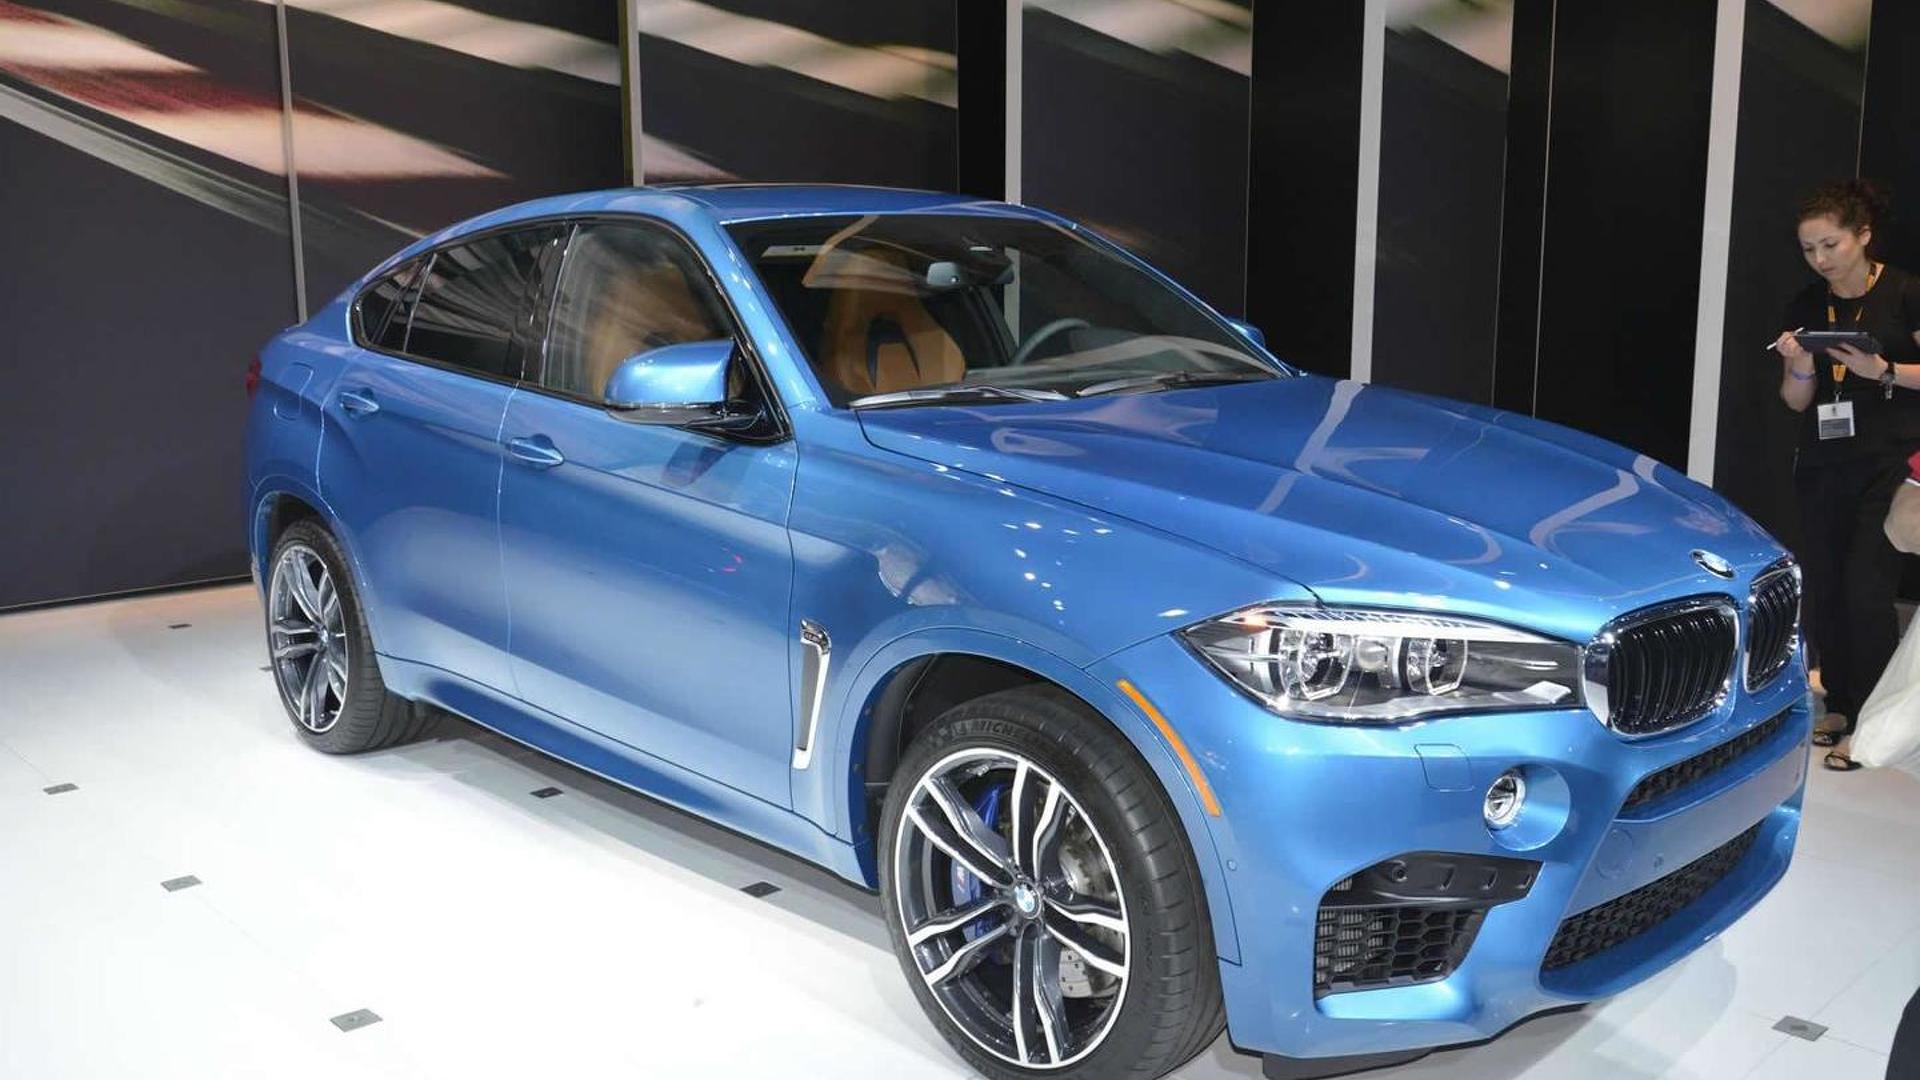 cars used bmw fine fl carsforsale for sport stock miami sale in m suv florida